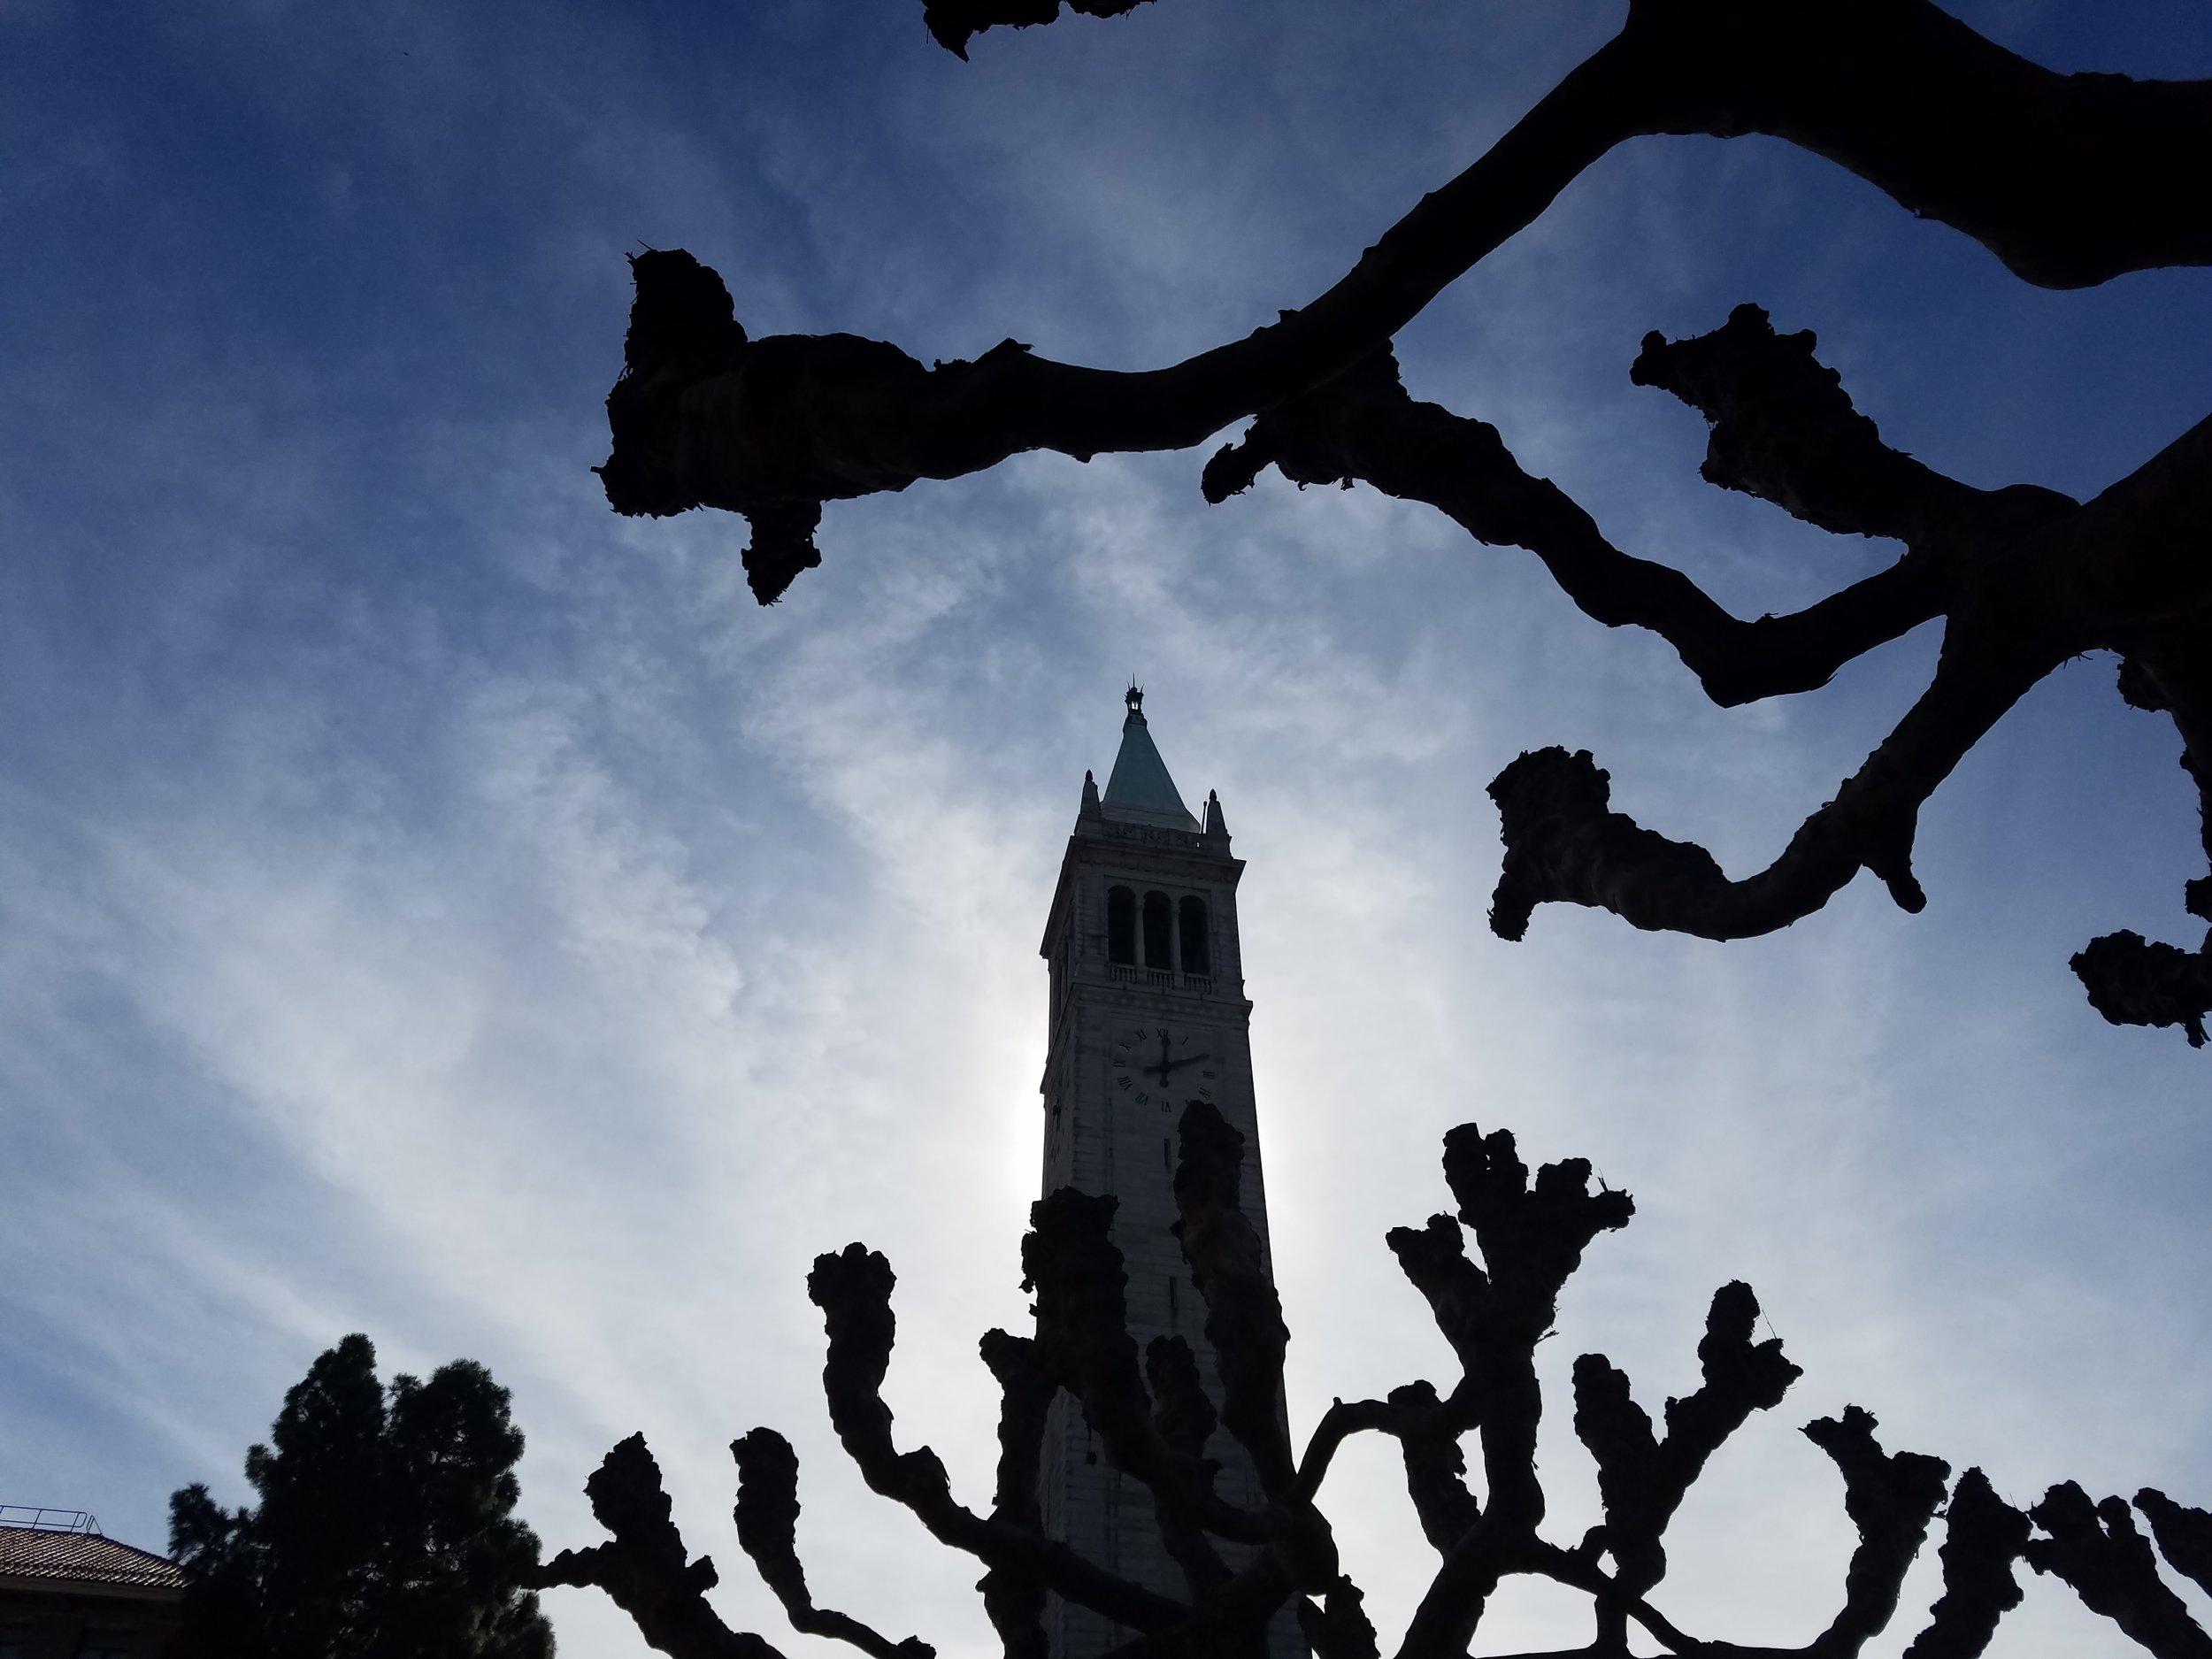 The Campanile (Sather Tower), Berkeley, CA Feb 2018